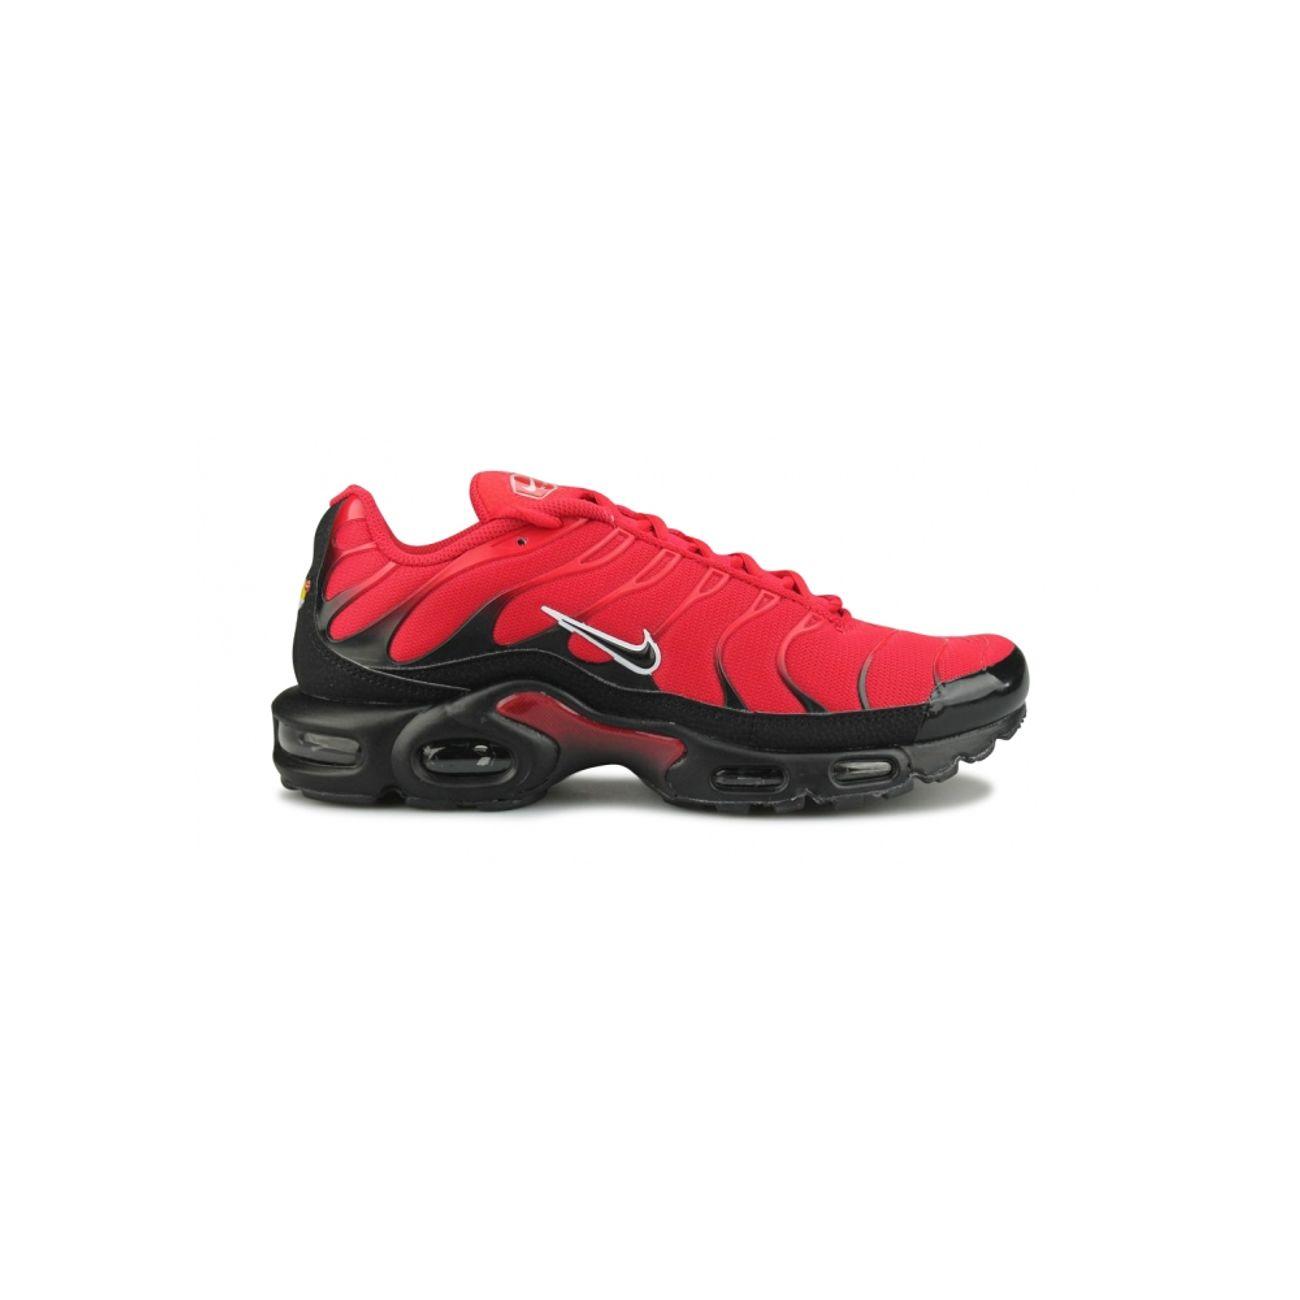 134dbd08ef8 Mode- Lifestyle homme NIKE Basket Nike Air Max Plus Tn Tuned Rouge  852630-603 ...